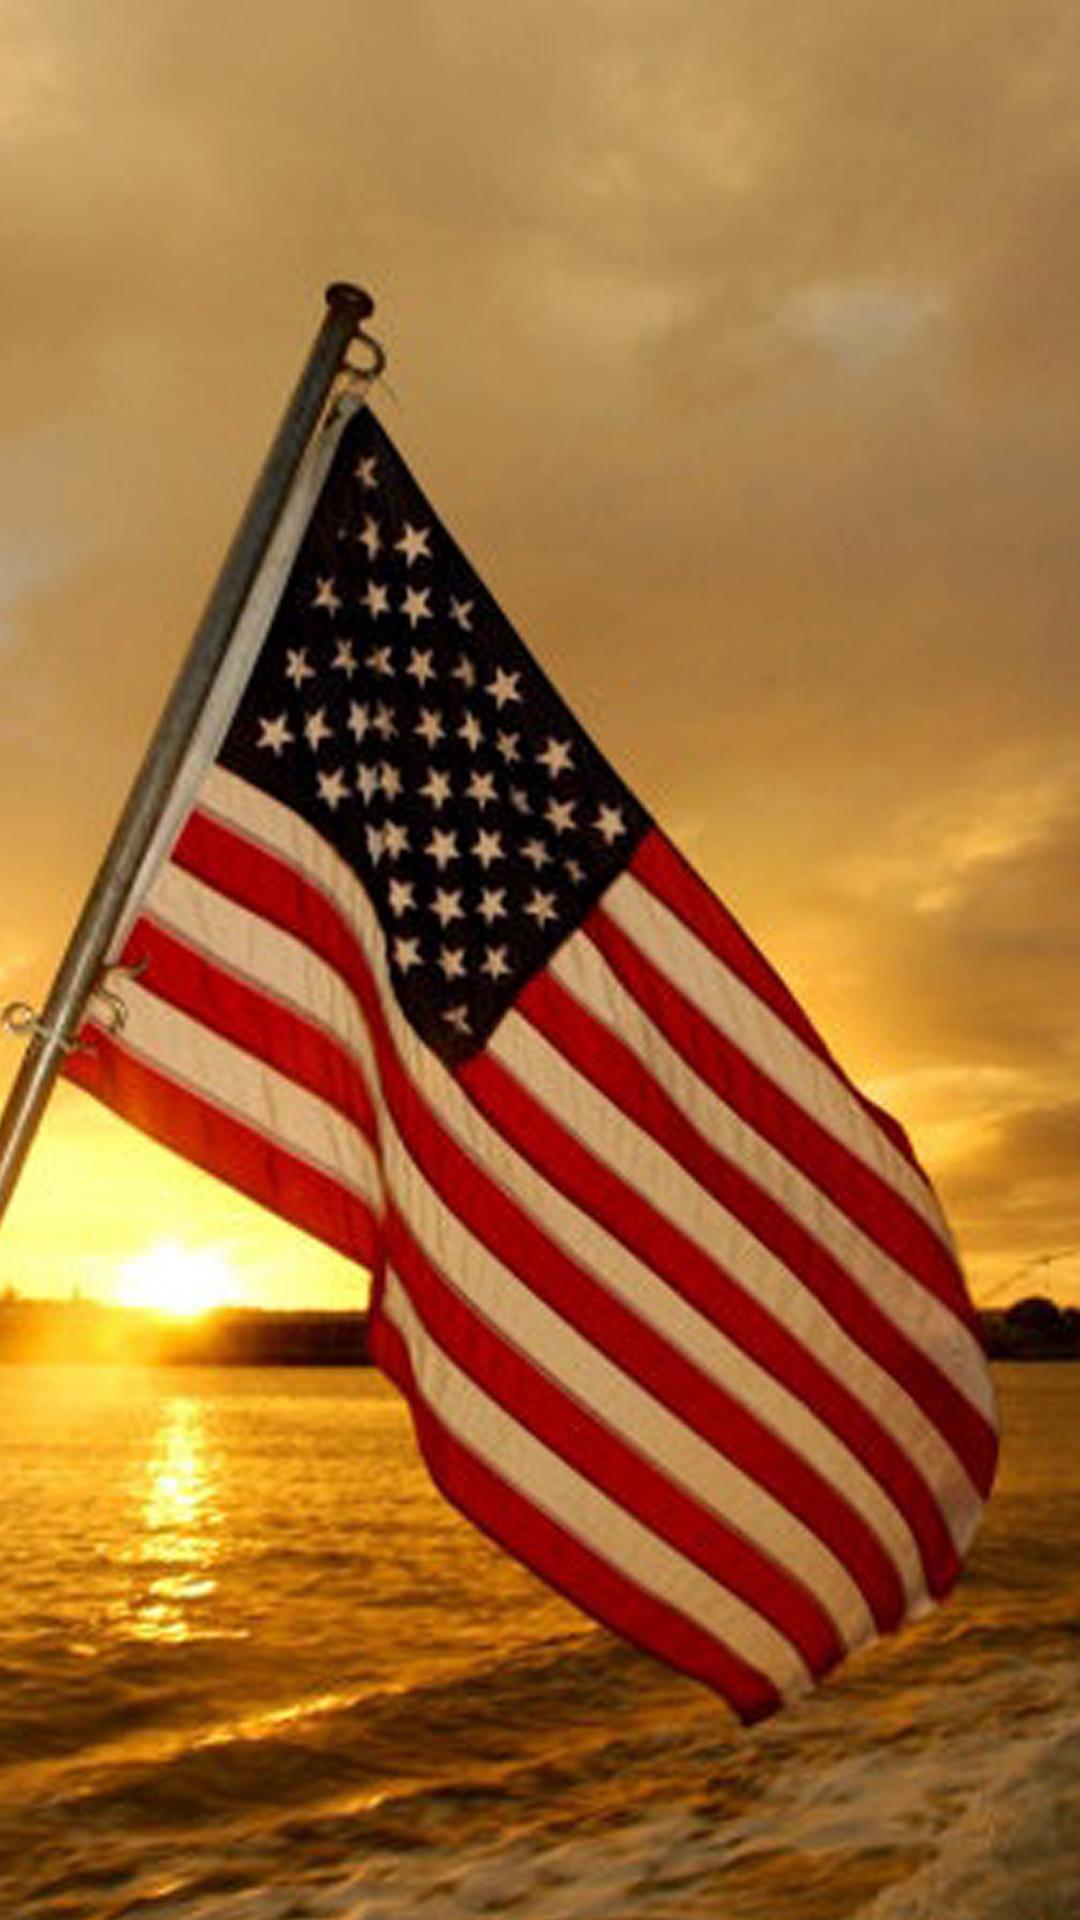 Boat Yacht Rental Usa Flag Wallpaper Iphone